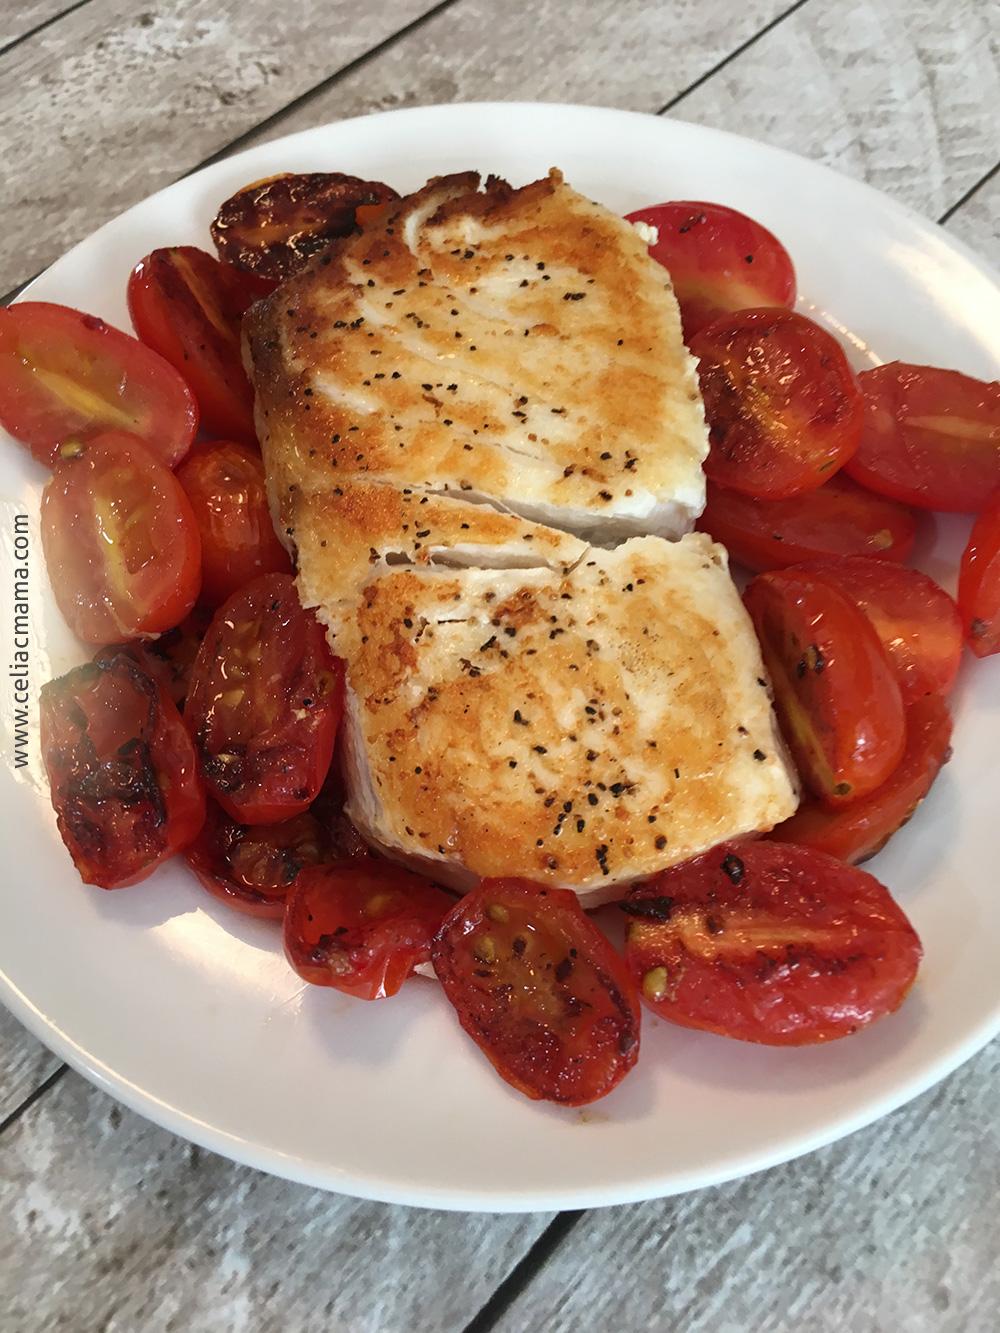 gf-halibut-with-tomato-balsamic-glaze